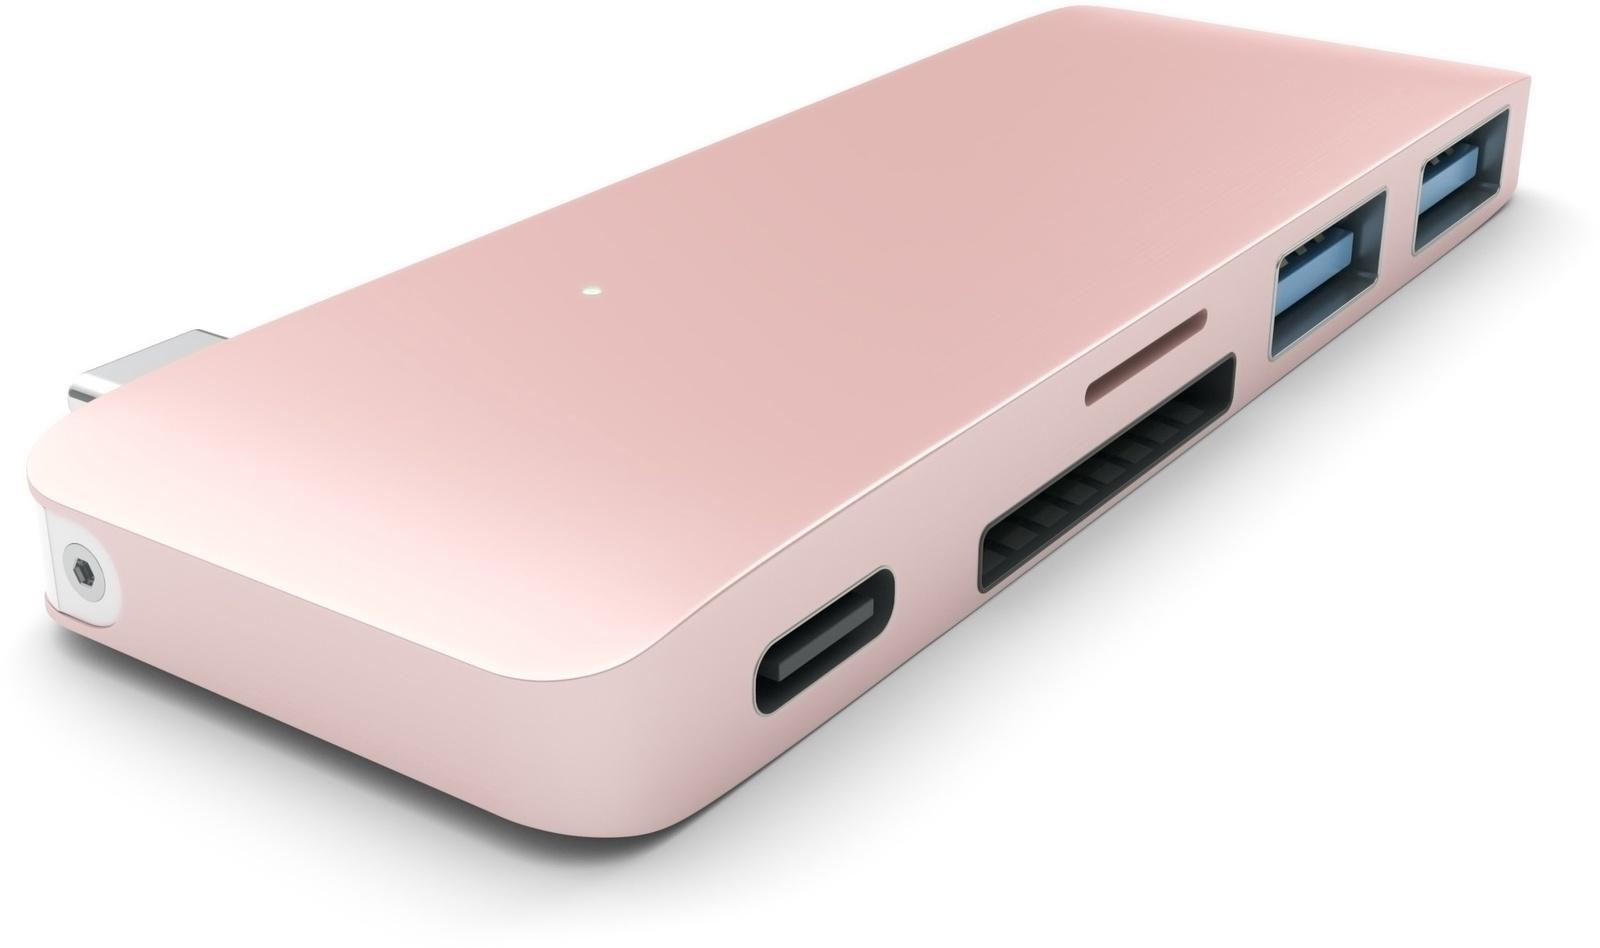 USB-хаб Satechi Type-C USB 3.0 Розовое золото ST-TCUPR